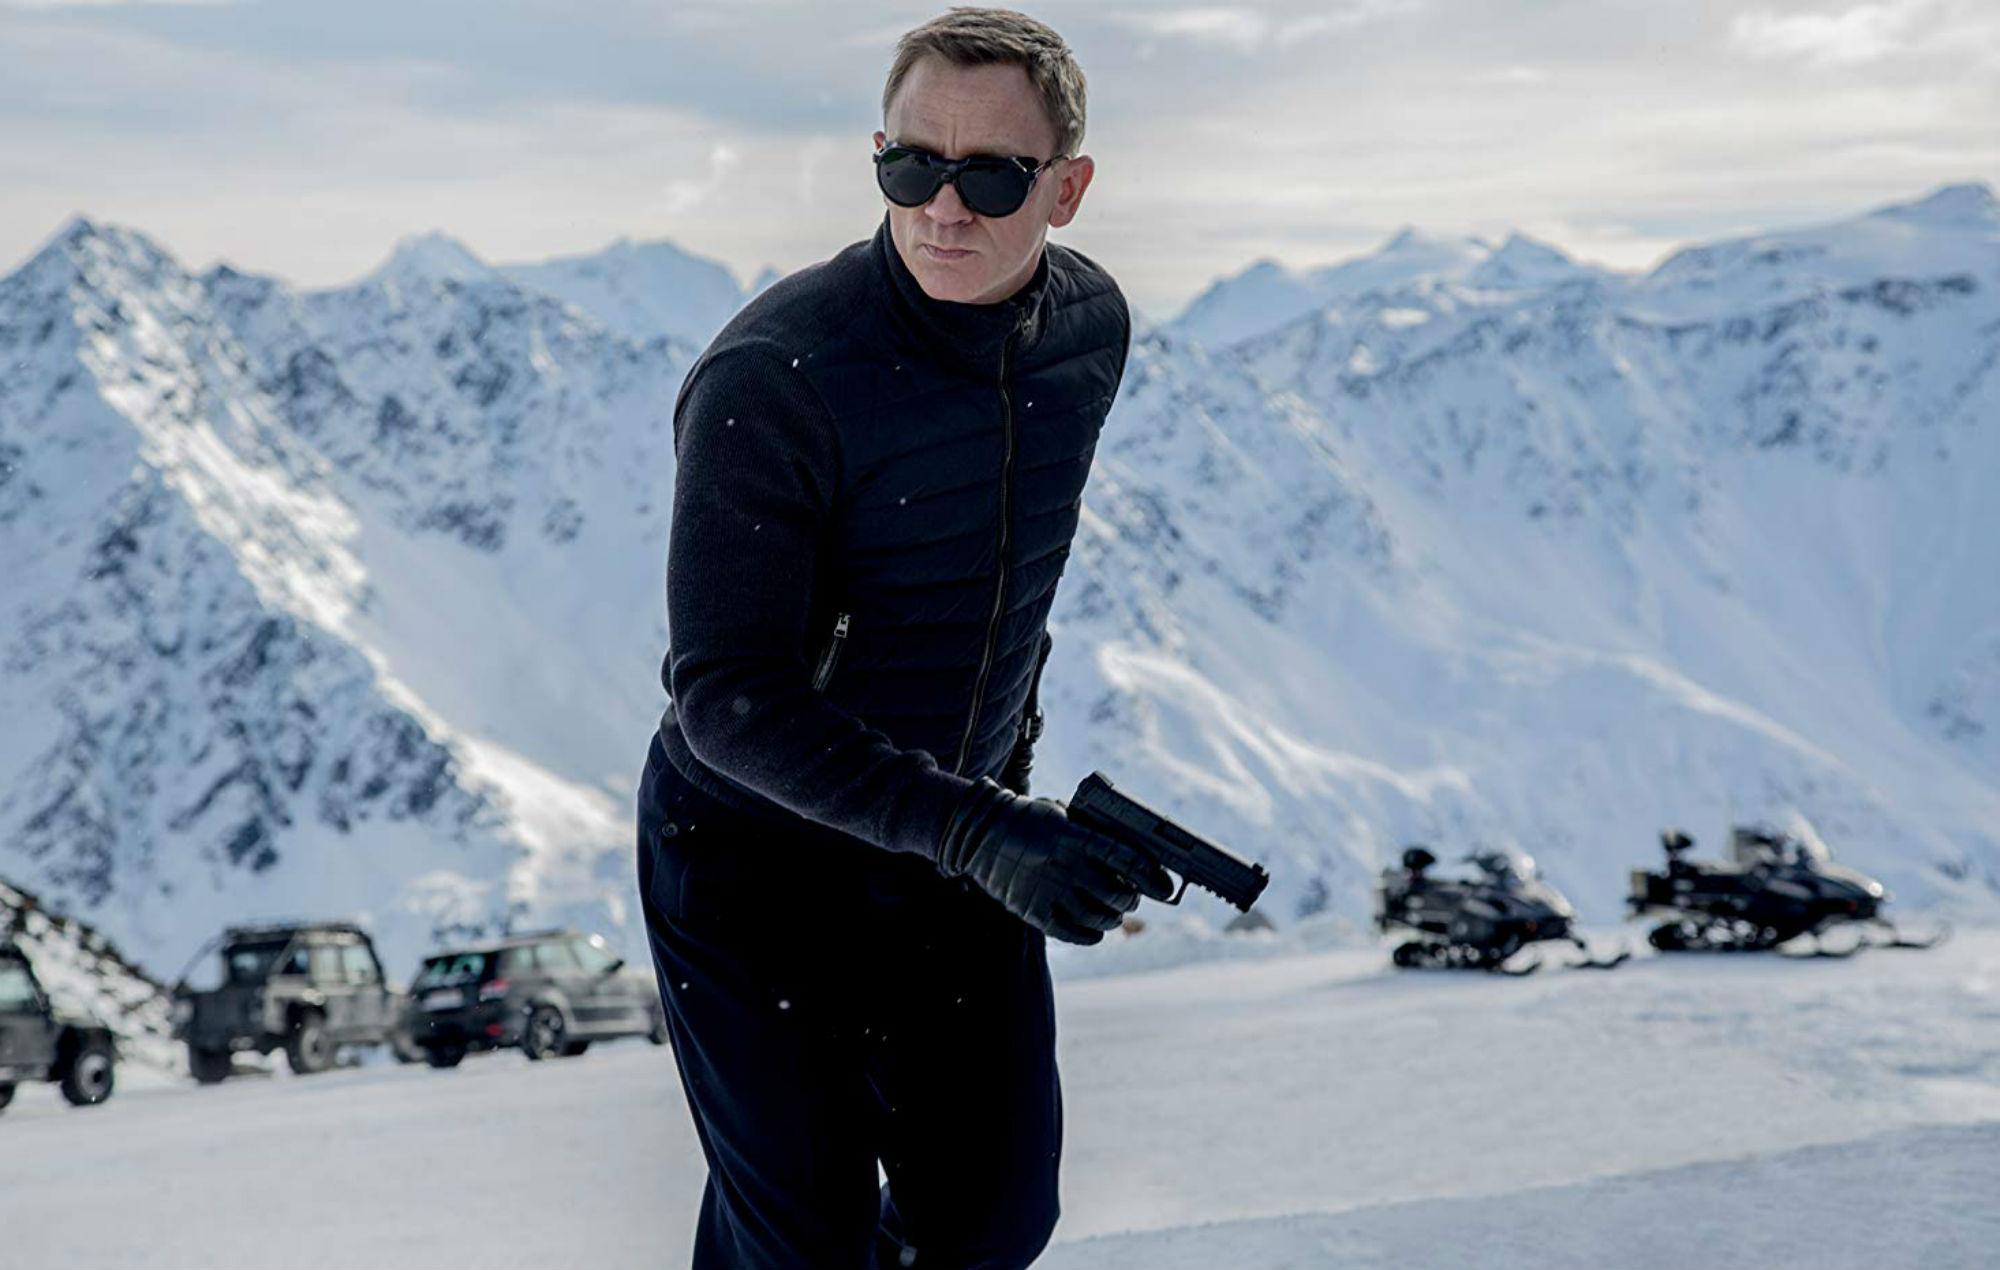 Bond Explosion